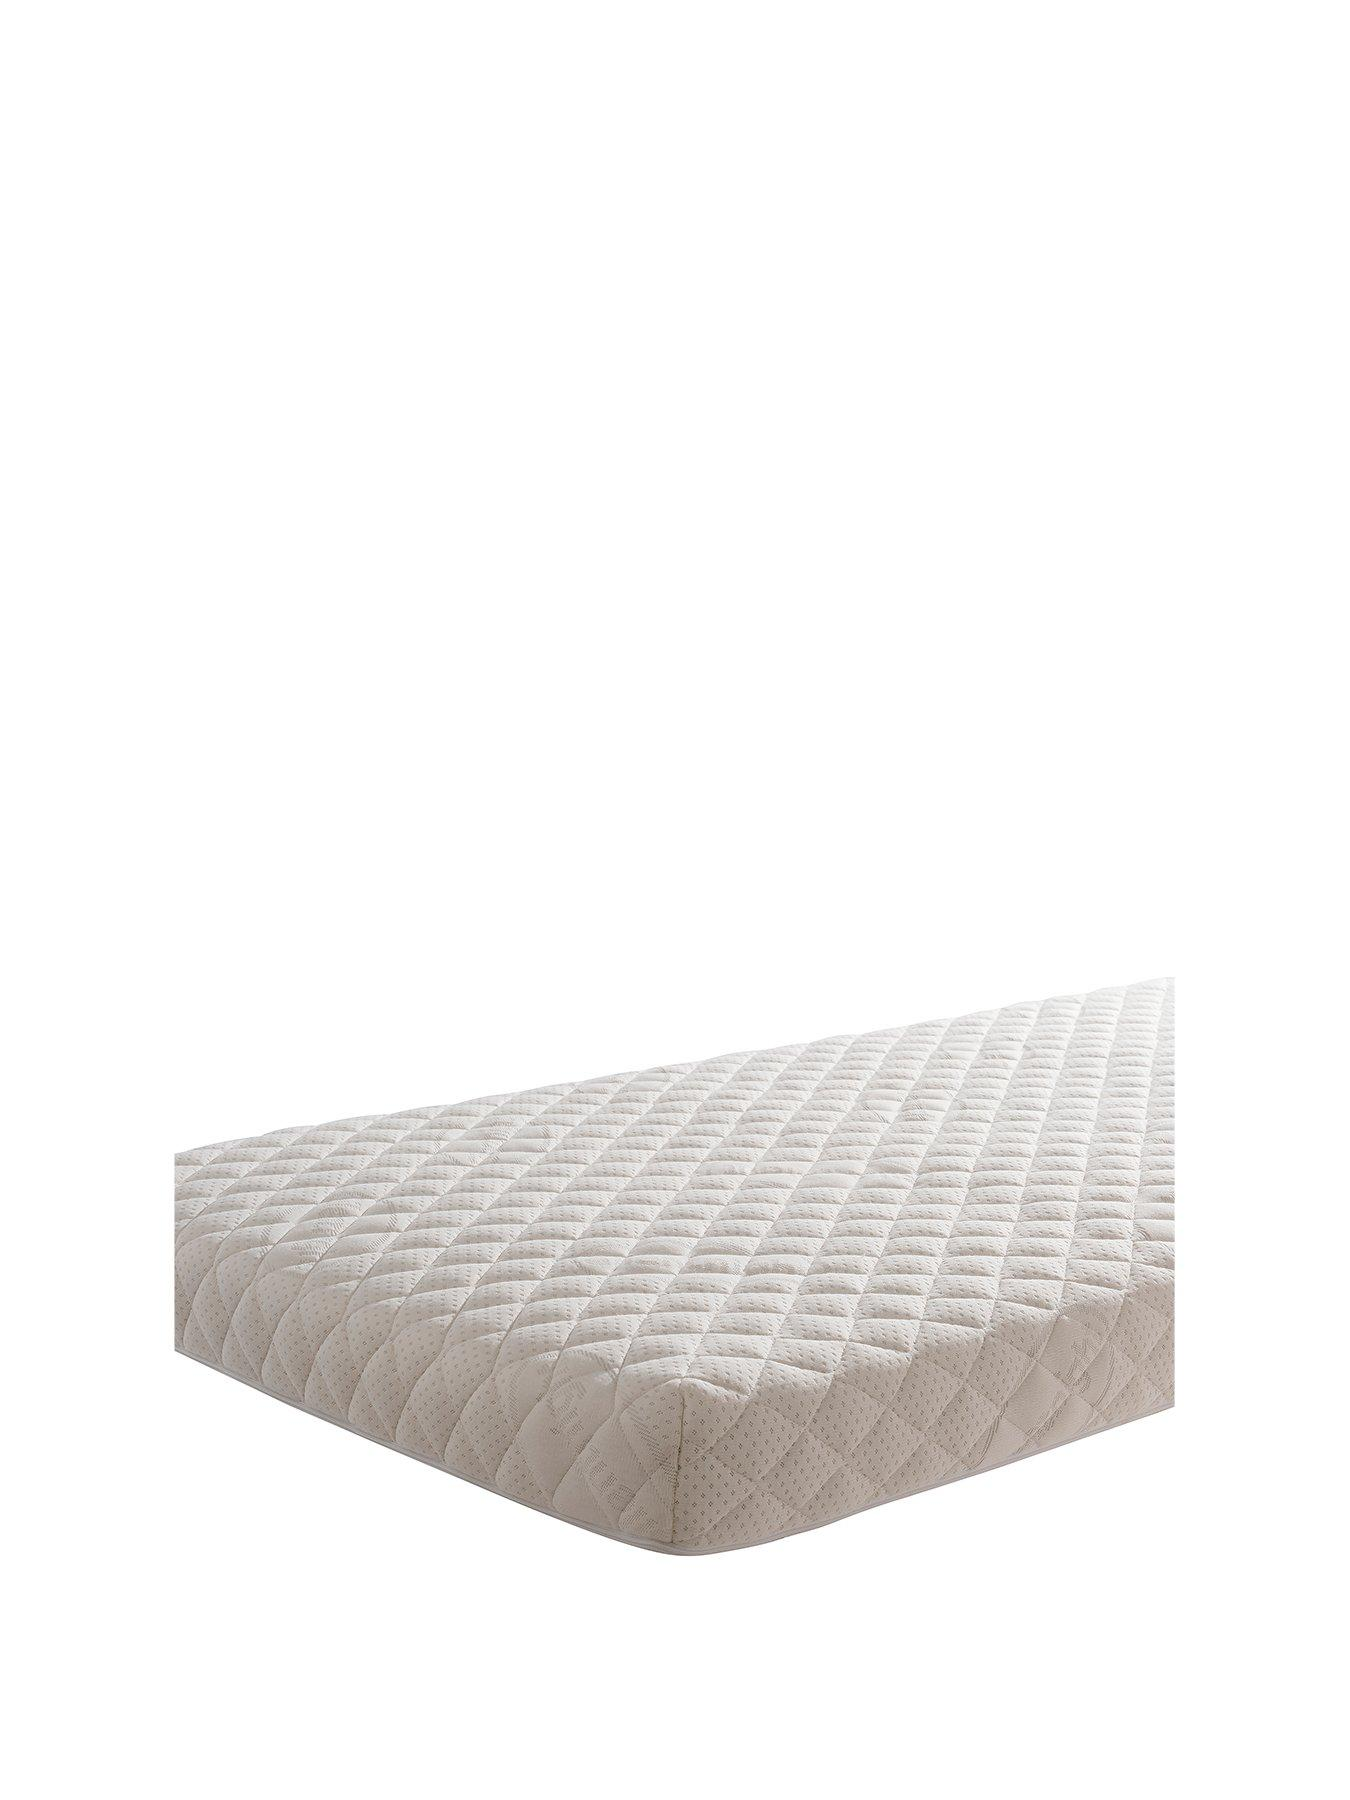 90x190cm Basics Memory-Foam-Mattress Superb